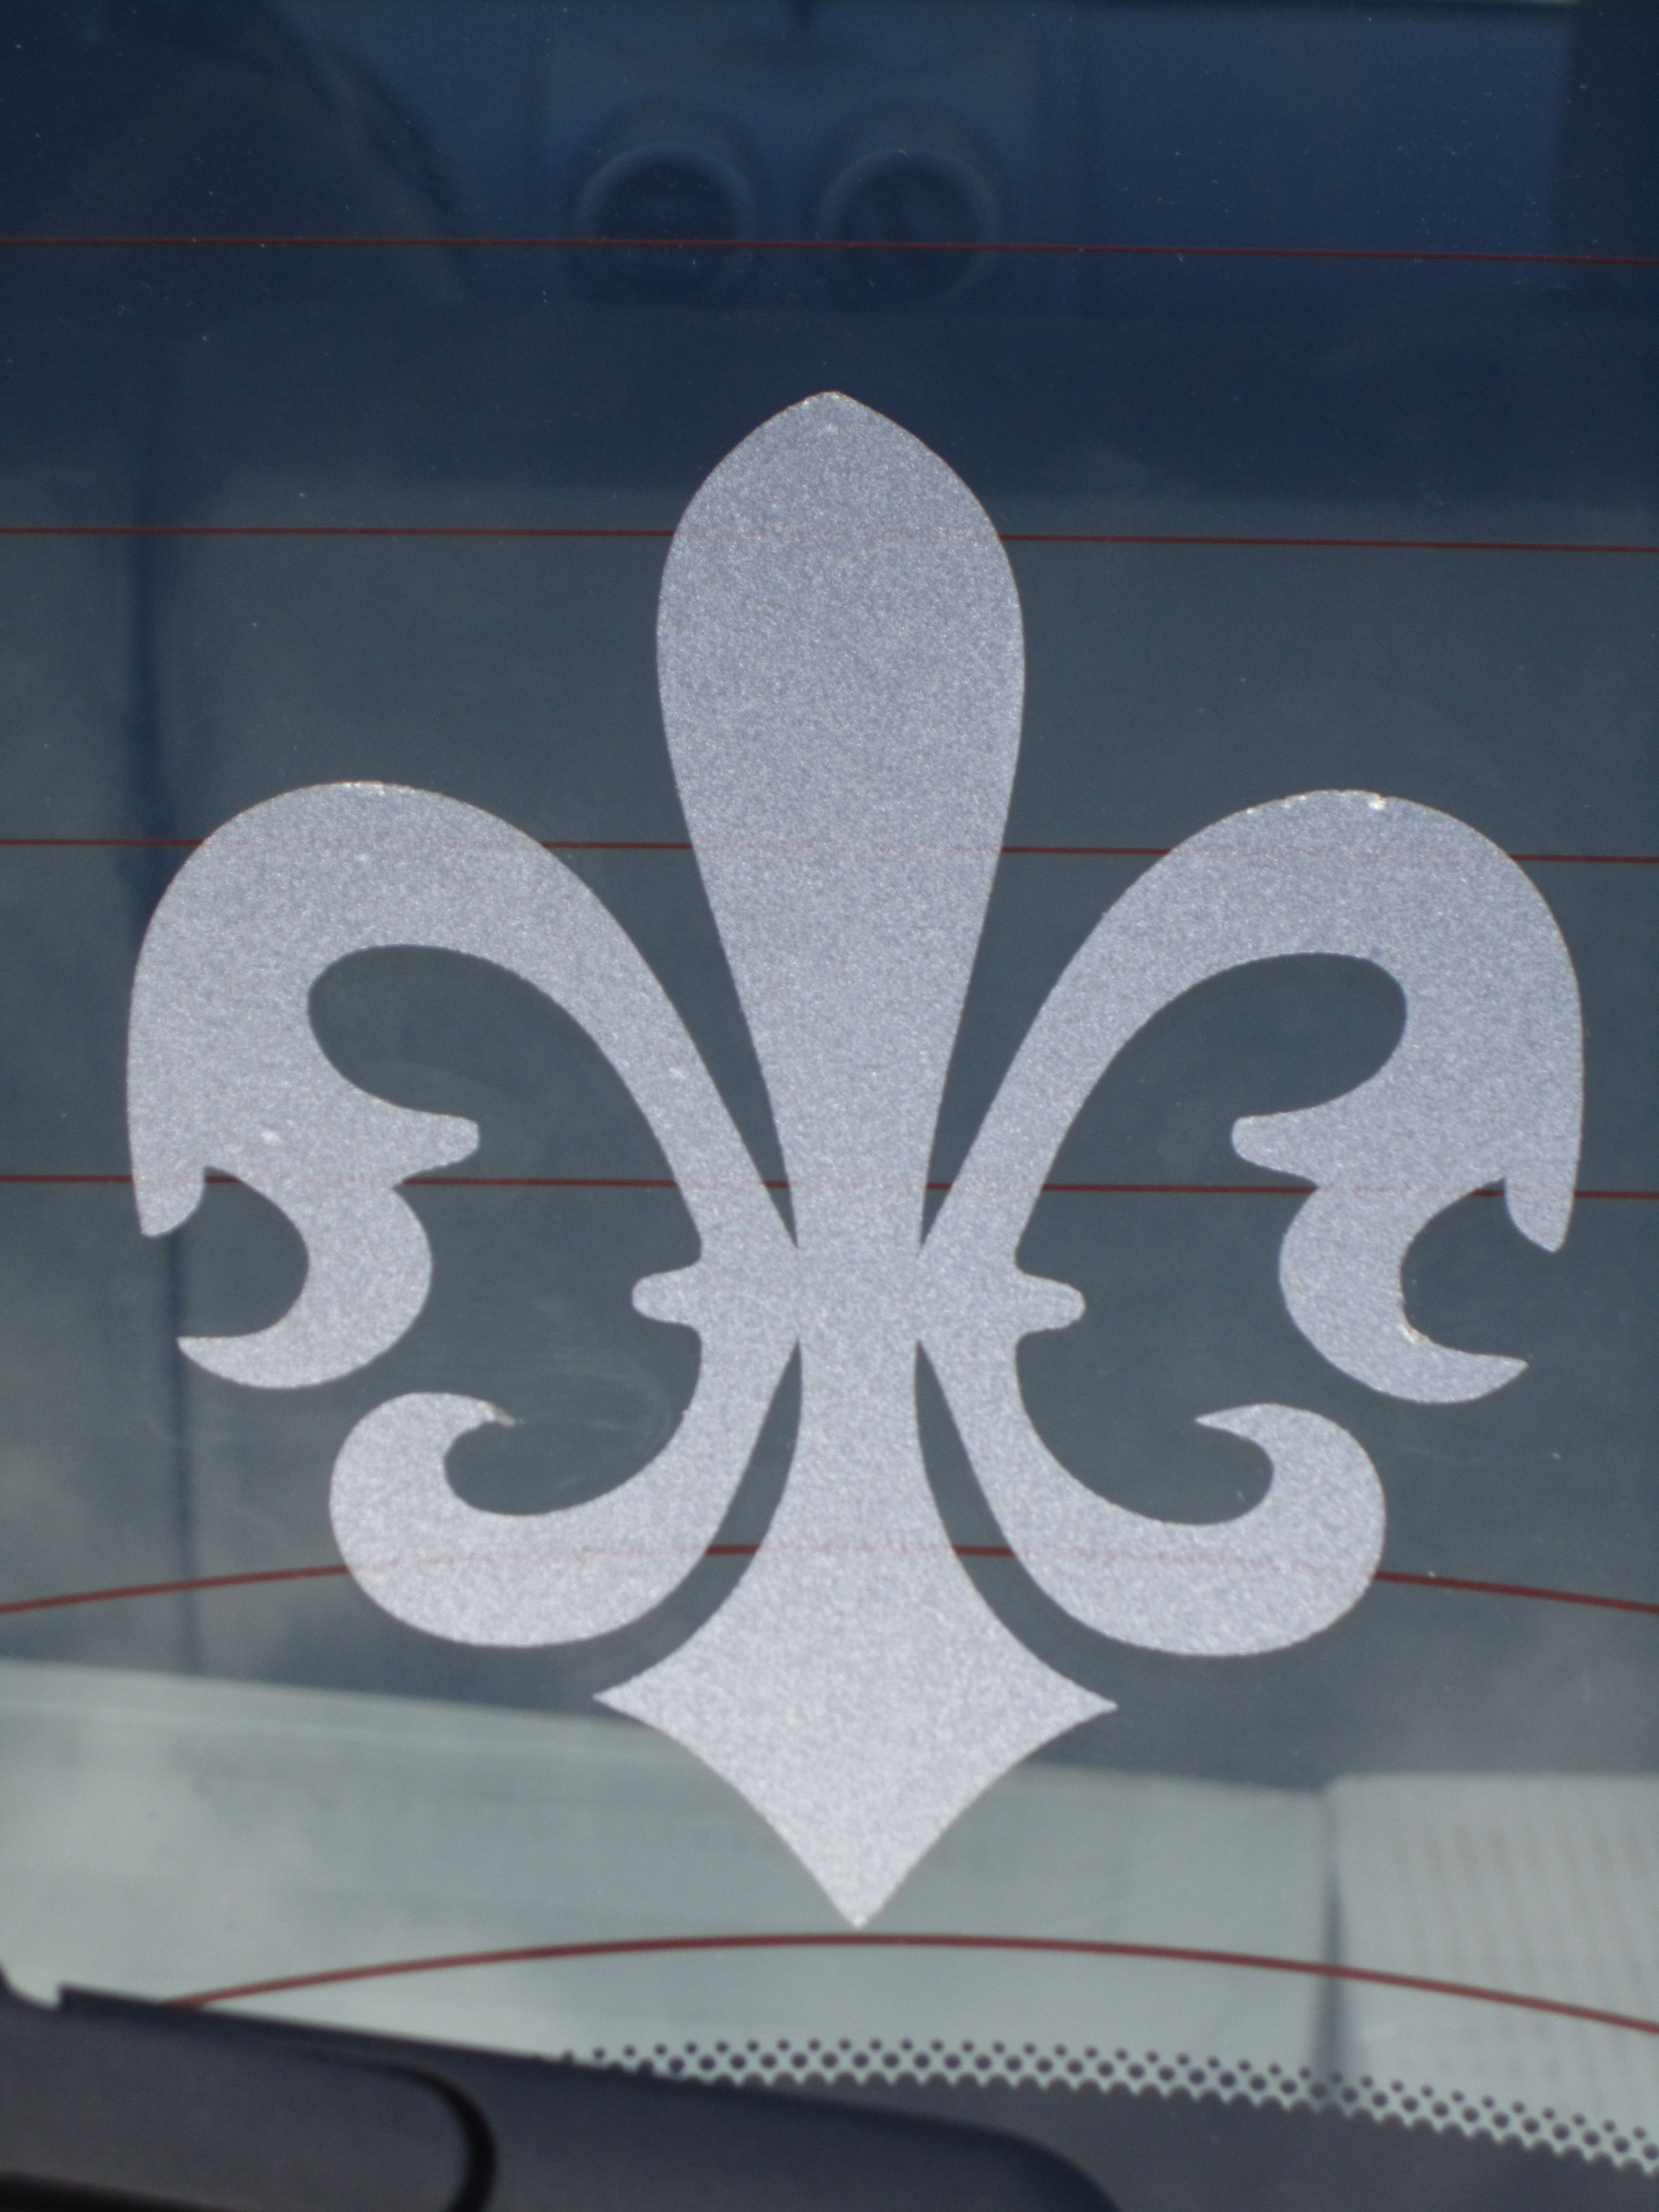 4 inch car decal Car decals, Diy crafts, Crafts